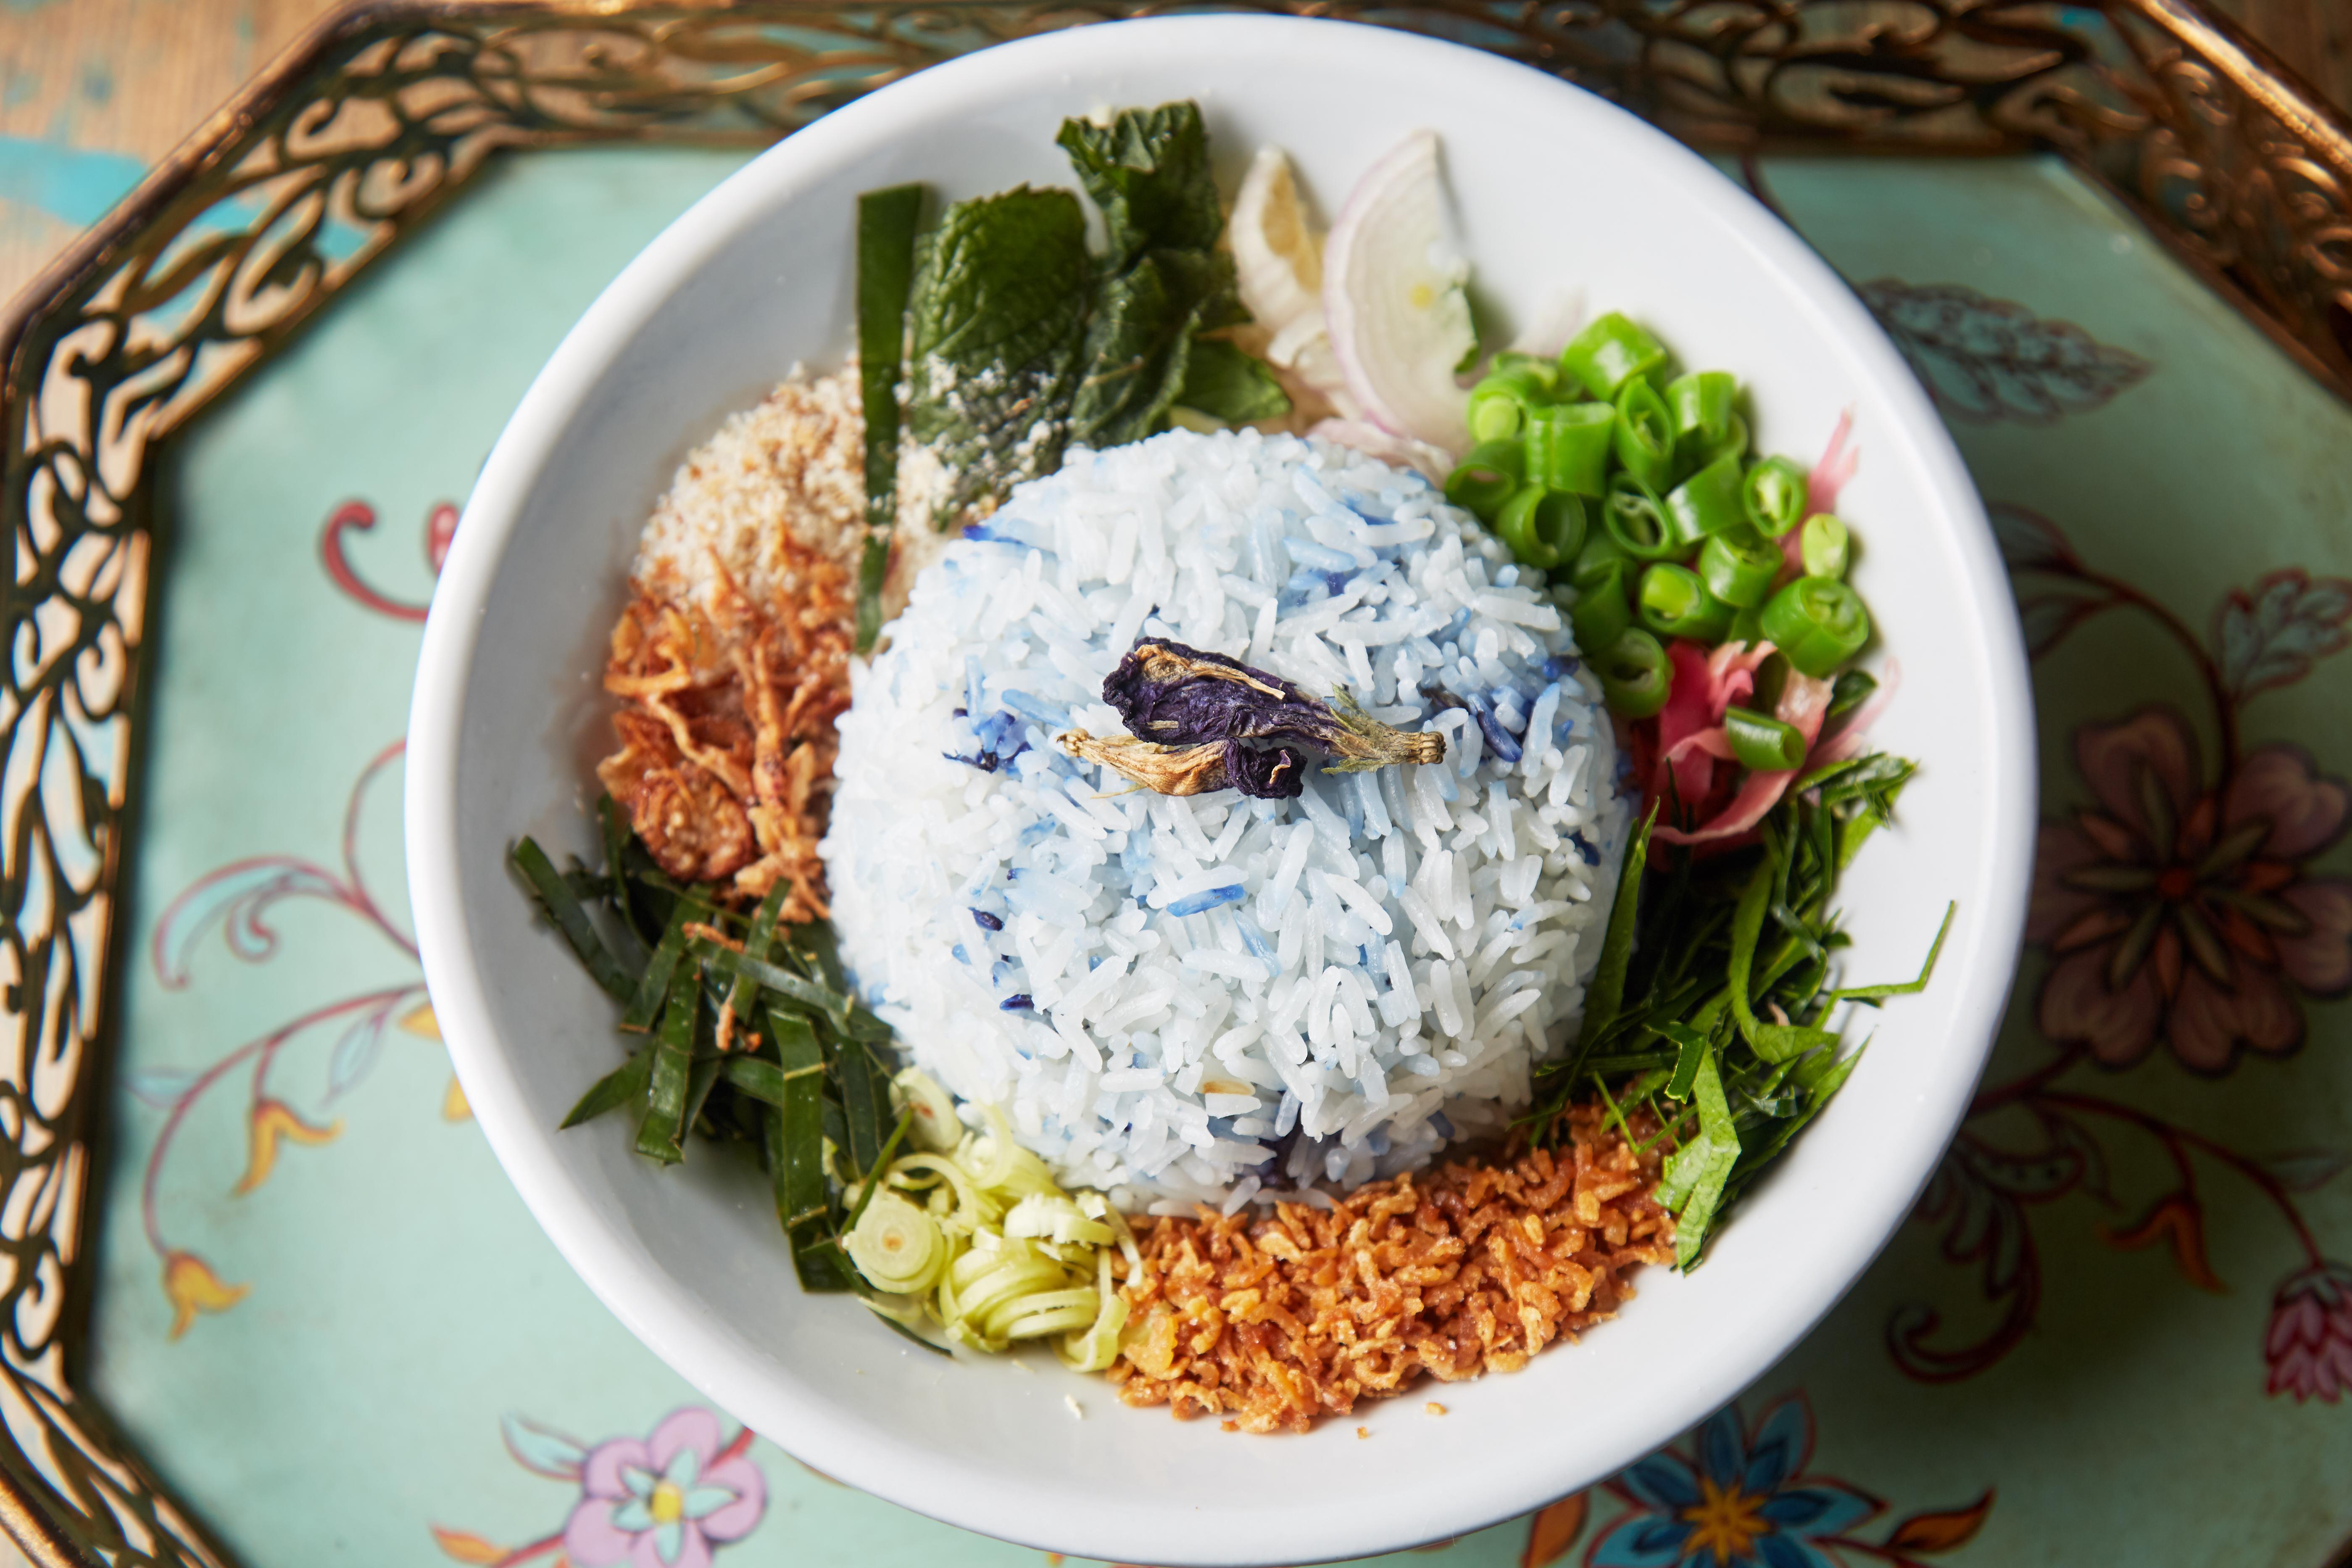 Nasi ulum, Peranakan mixed herb rice with dried shrimp